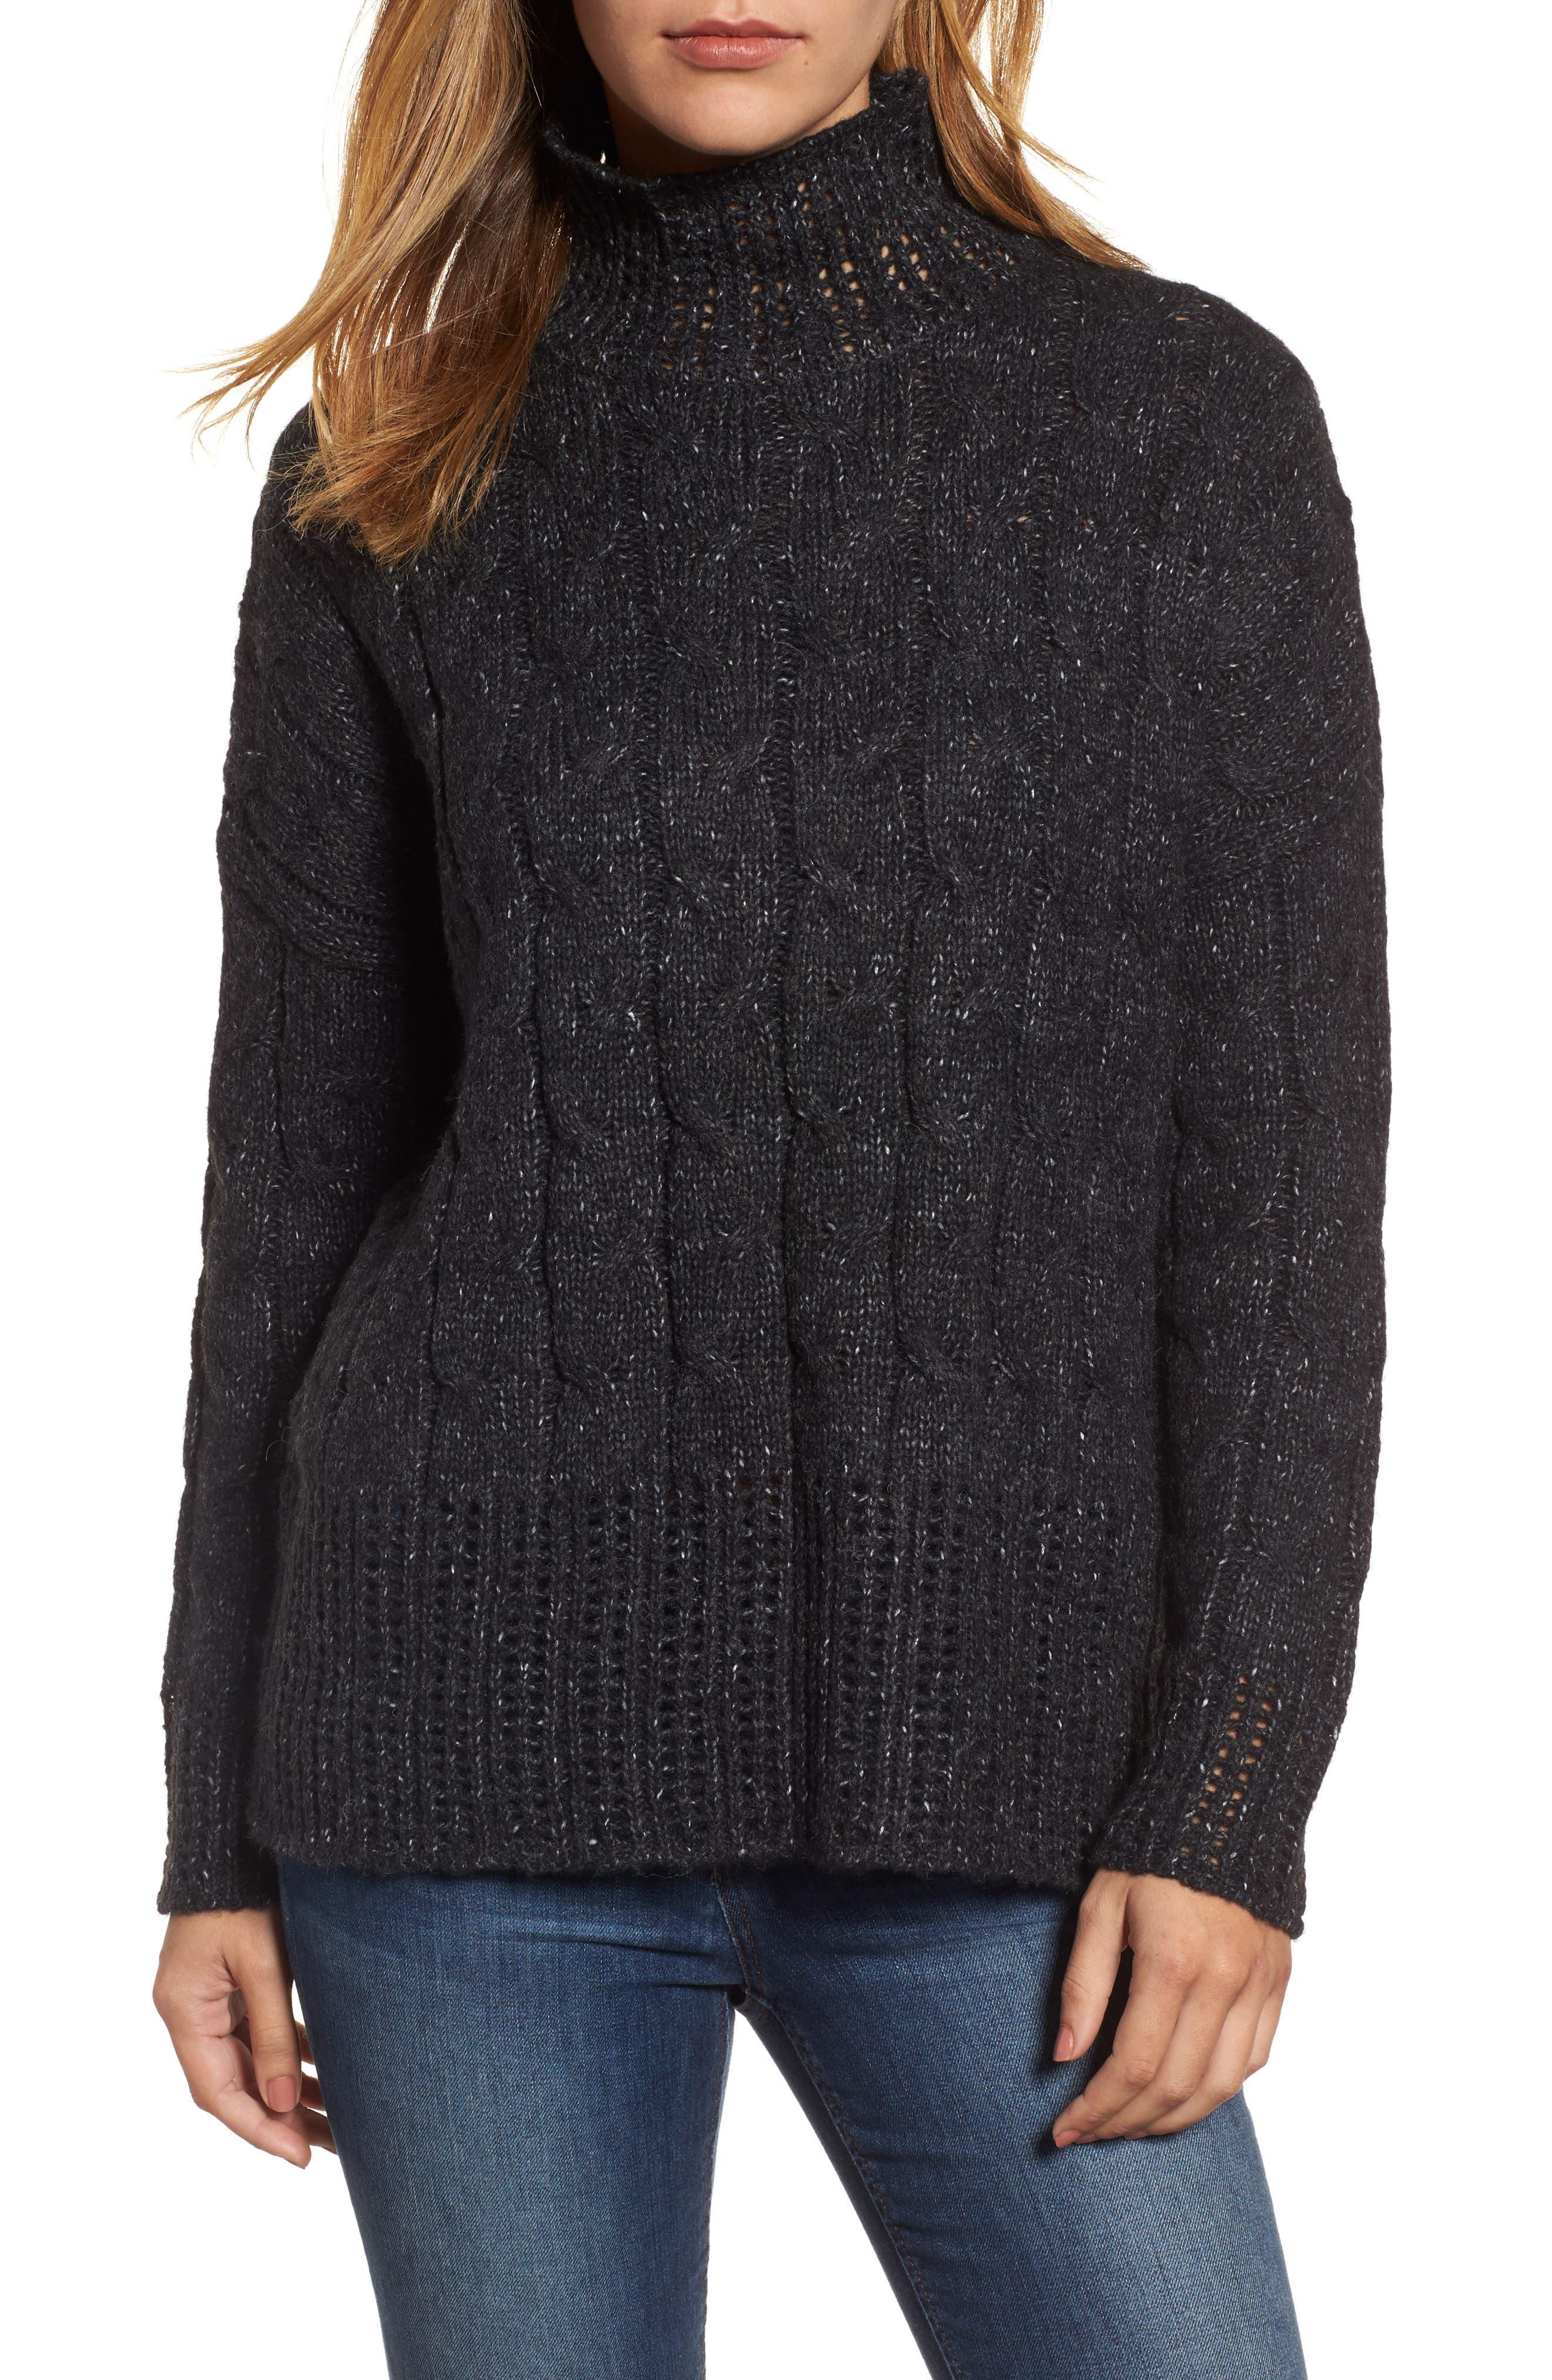 Pointelle Turtleneck Sweater,                         Main,                         color, 001